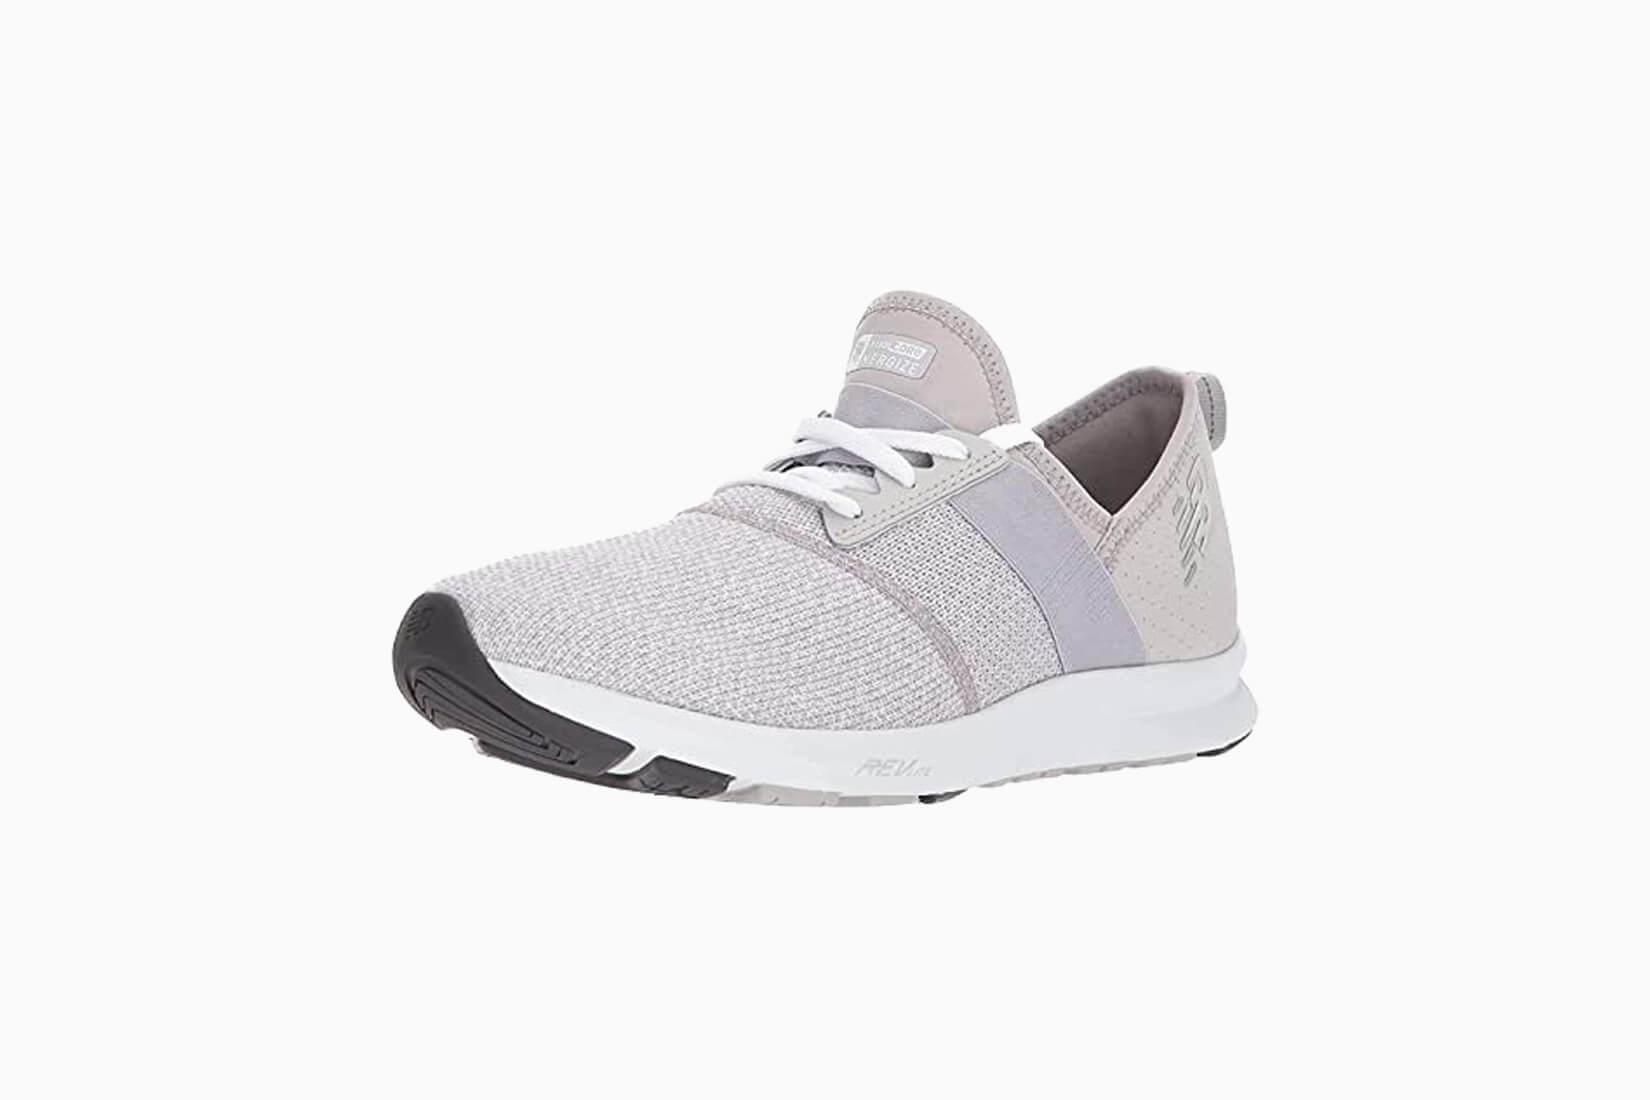 best workout shoes women new balance review - Luxe Digital